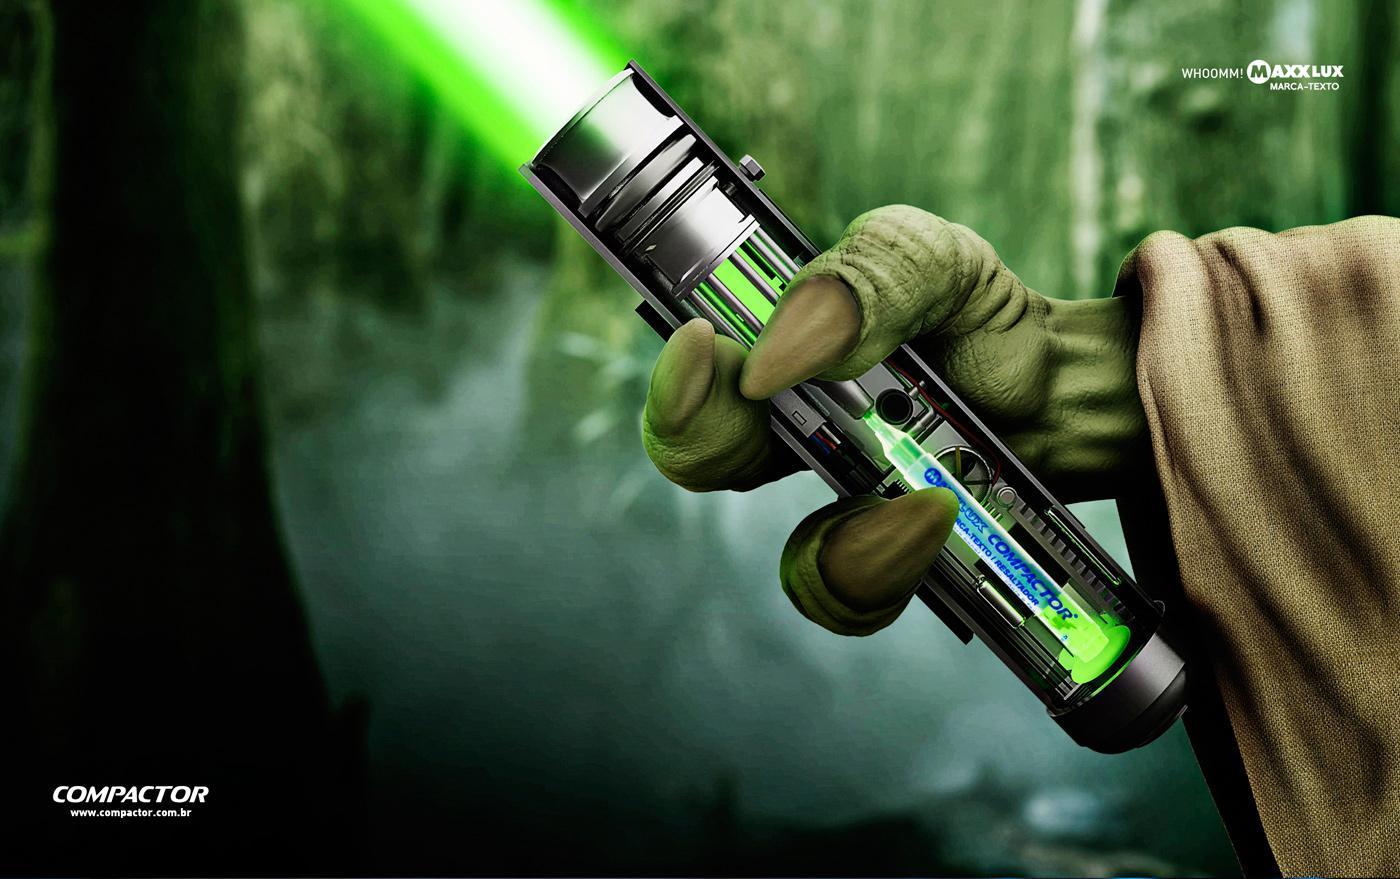 Compactor Print Ad -  Yoda